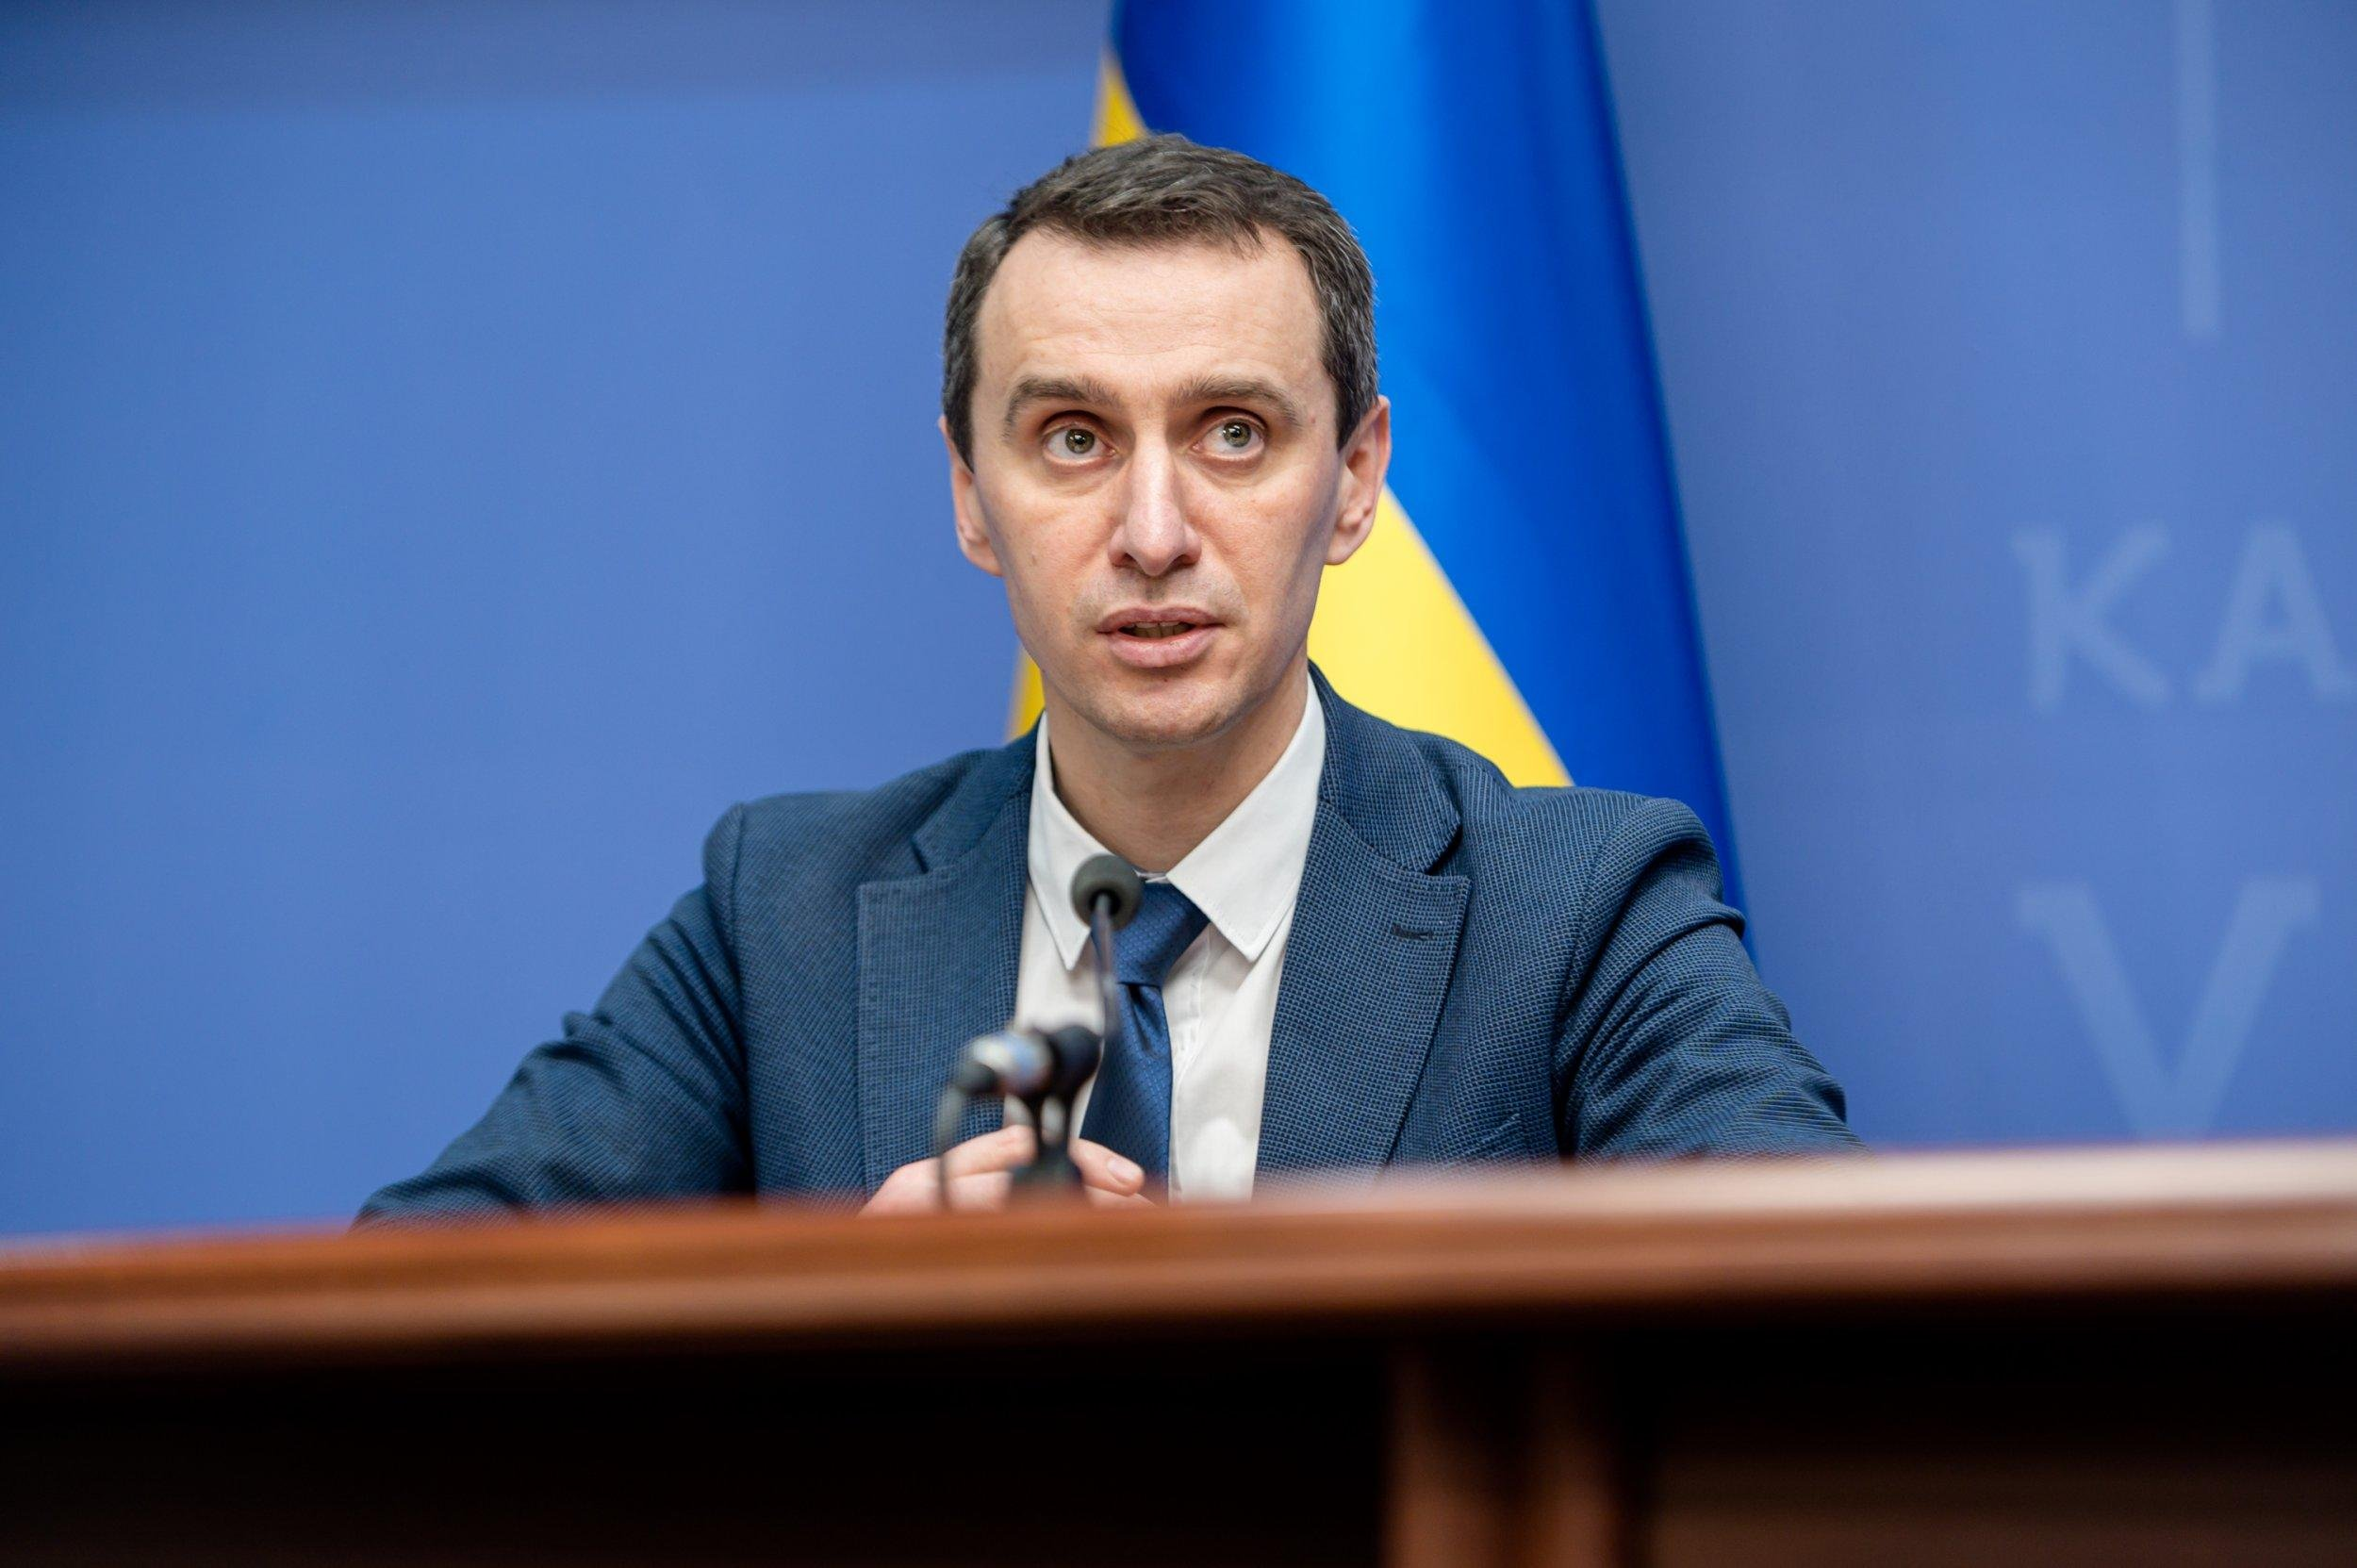 https://24tv.ua/resources/photos/news/202005/1352610.jpg?1590917744000